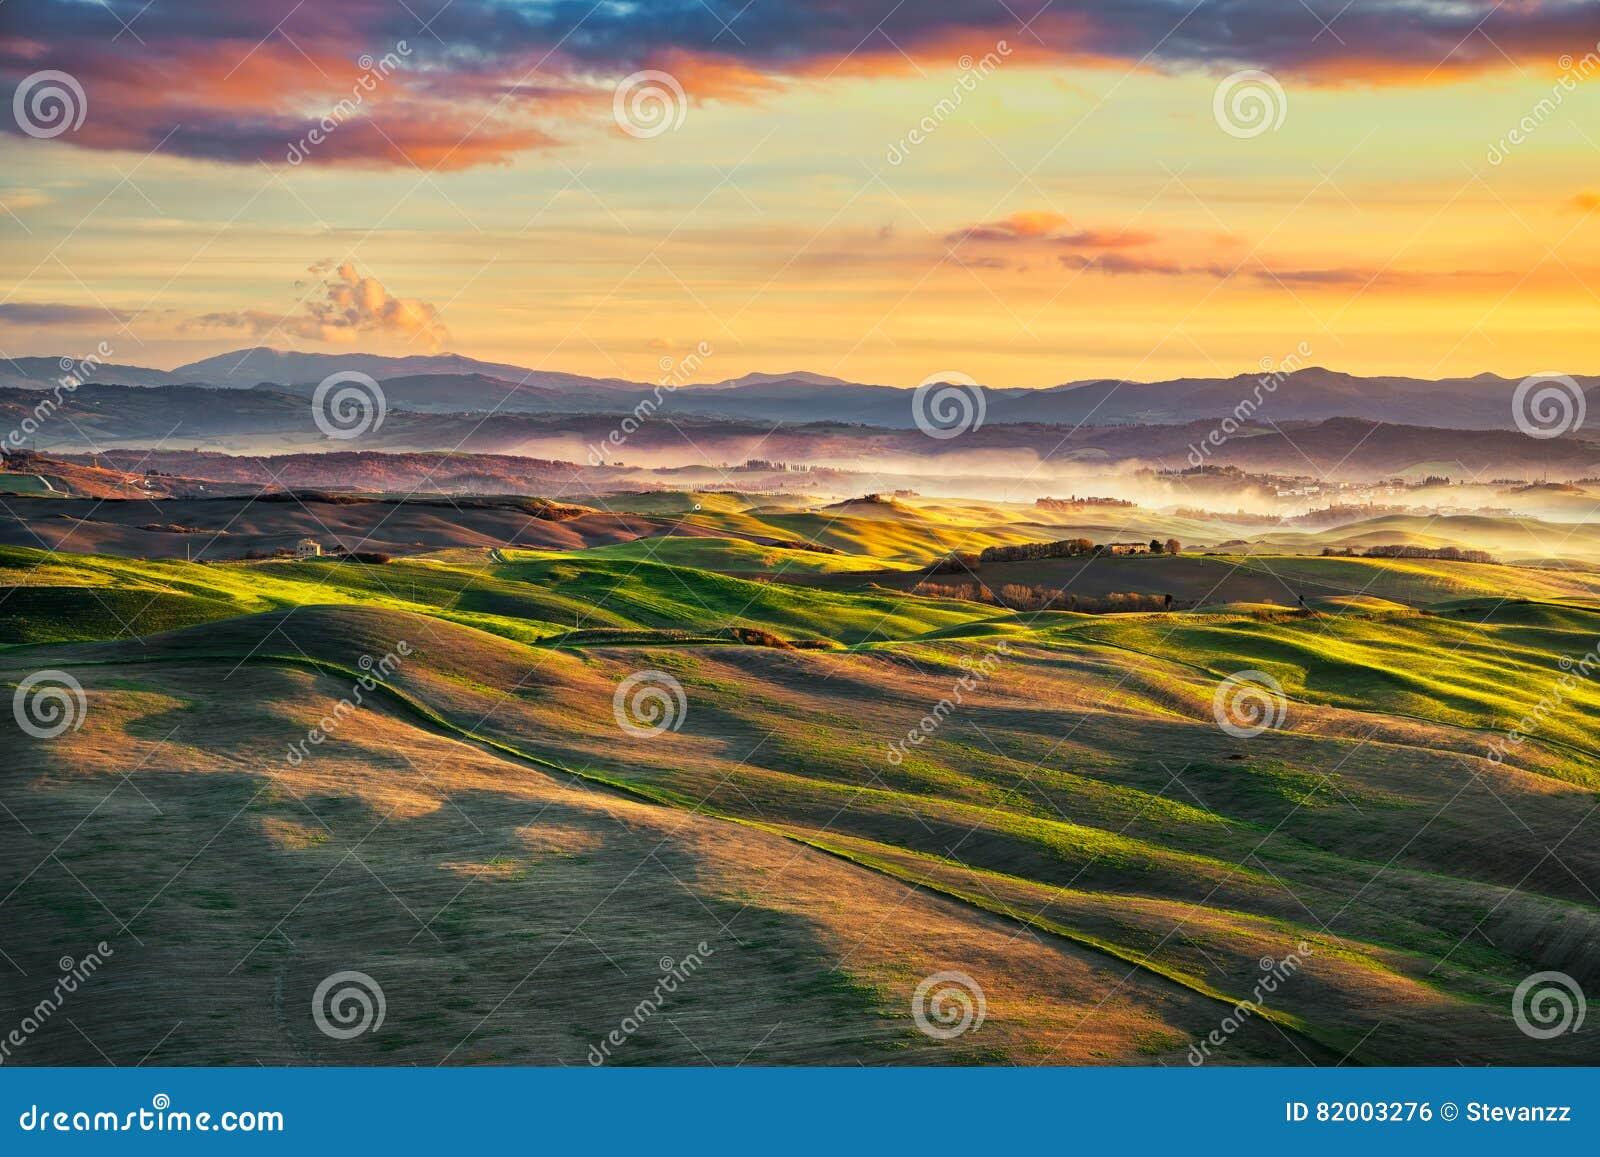 Volterra mgłowa panorama, toczni wzgórza i zieleni pola na sunse,